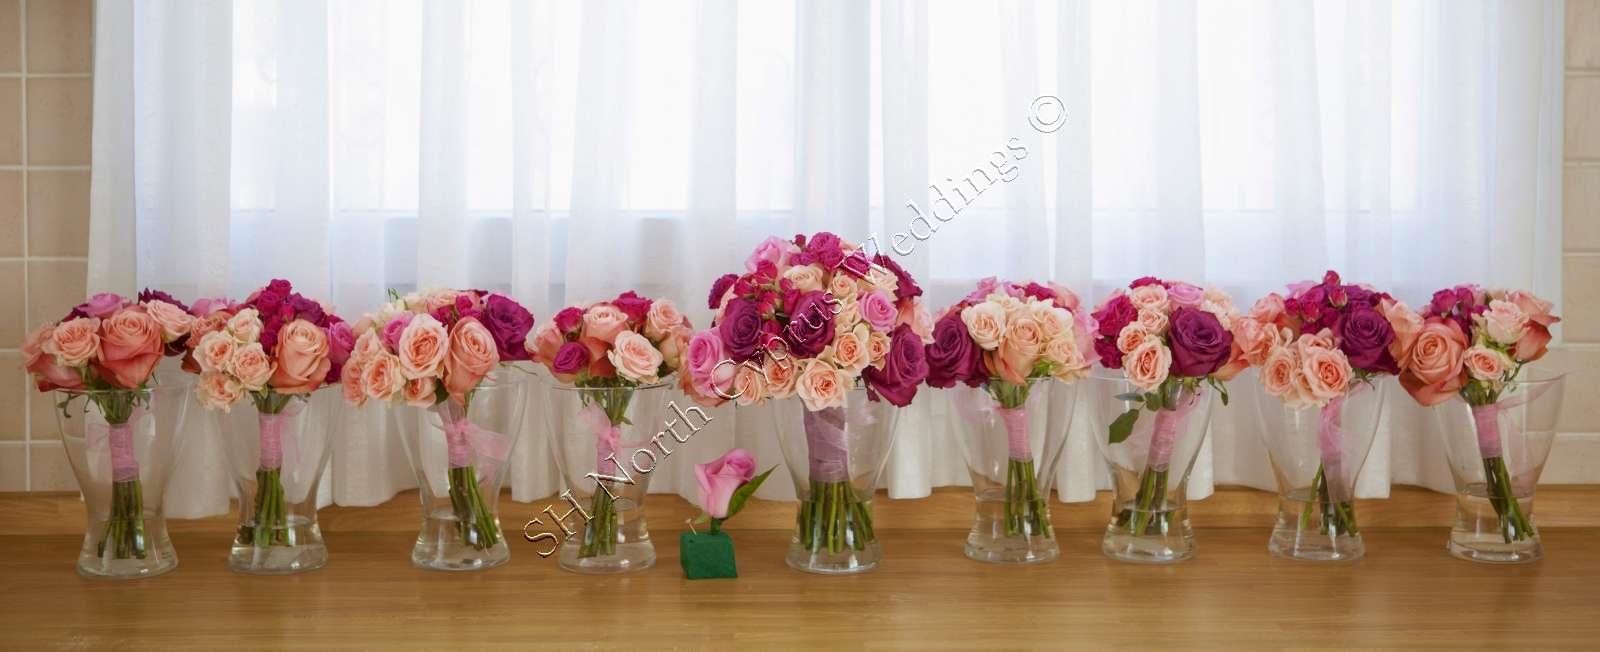 North Cyprus wedding flowers (121)